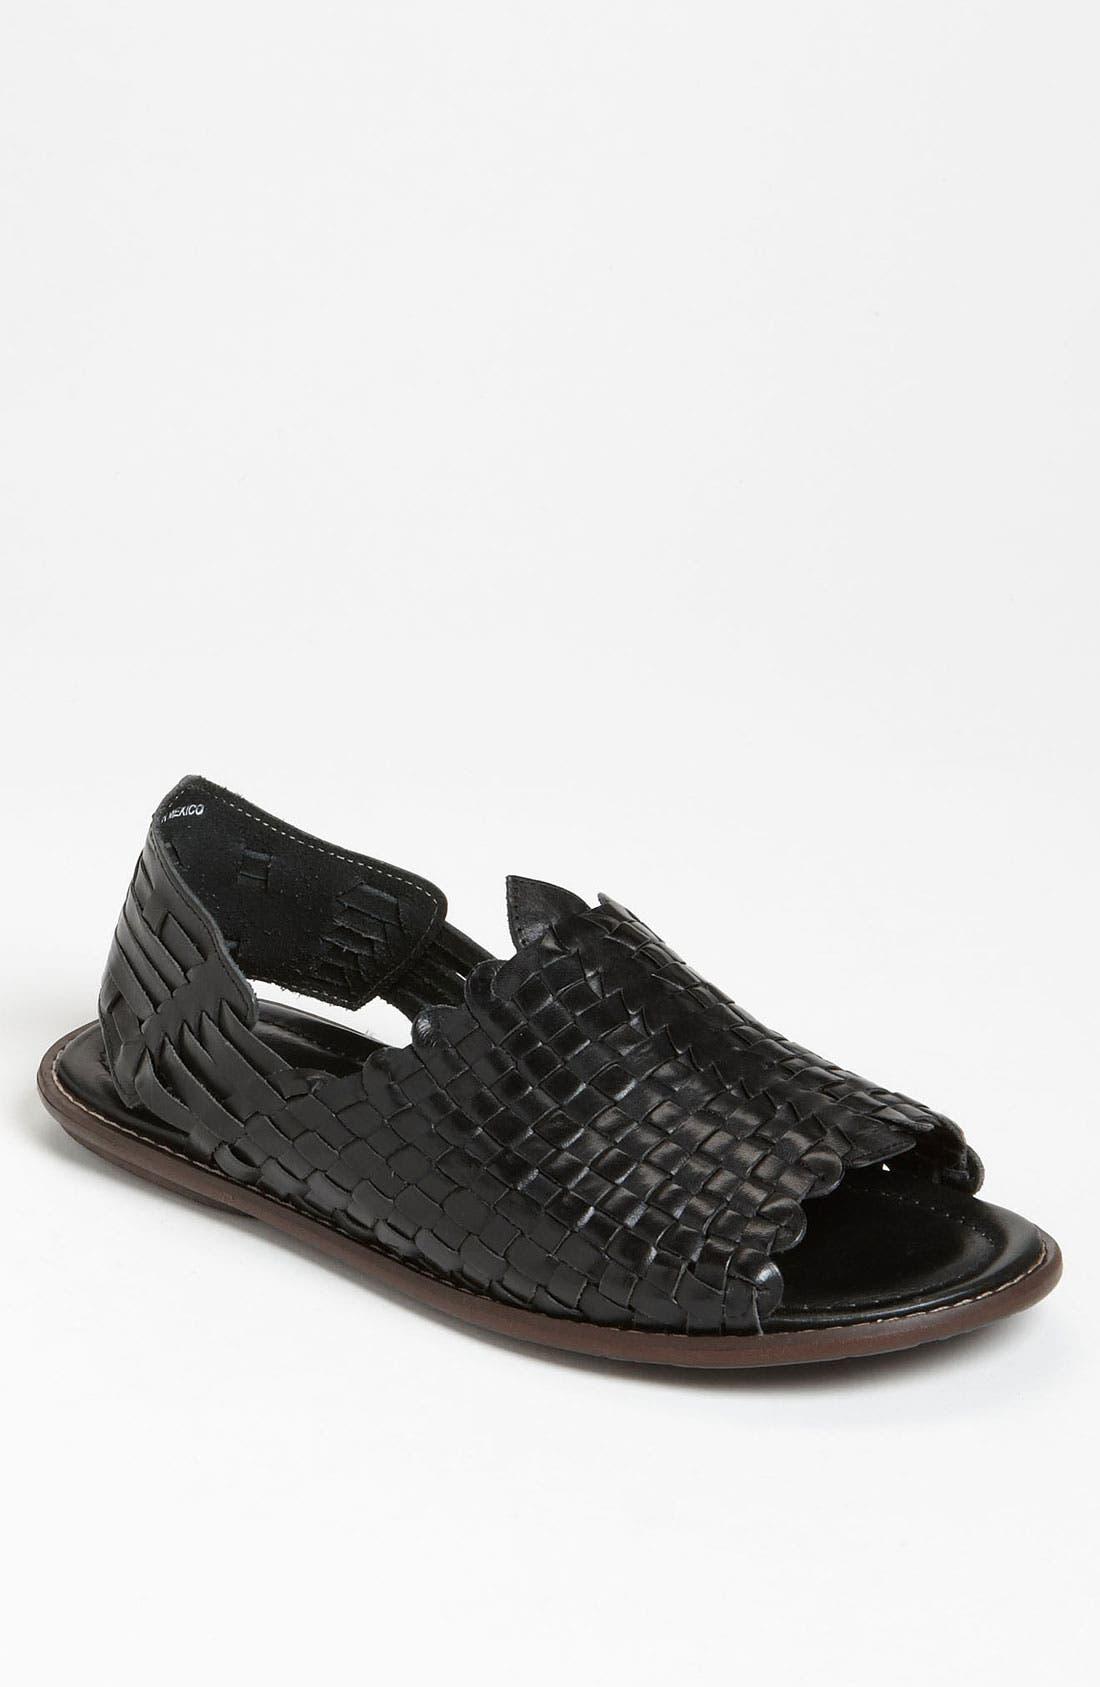 Main Image - Bed Stu 'El Principe' Huarache Sandal (Online Only) (Men)